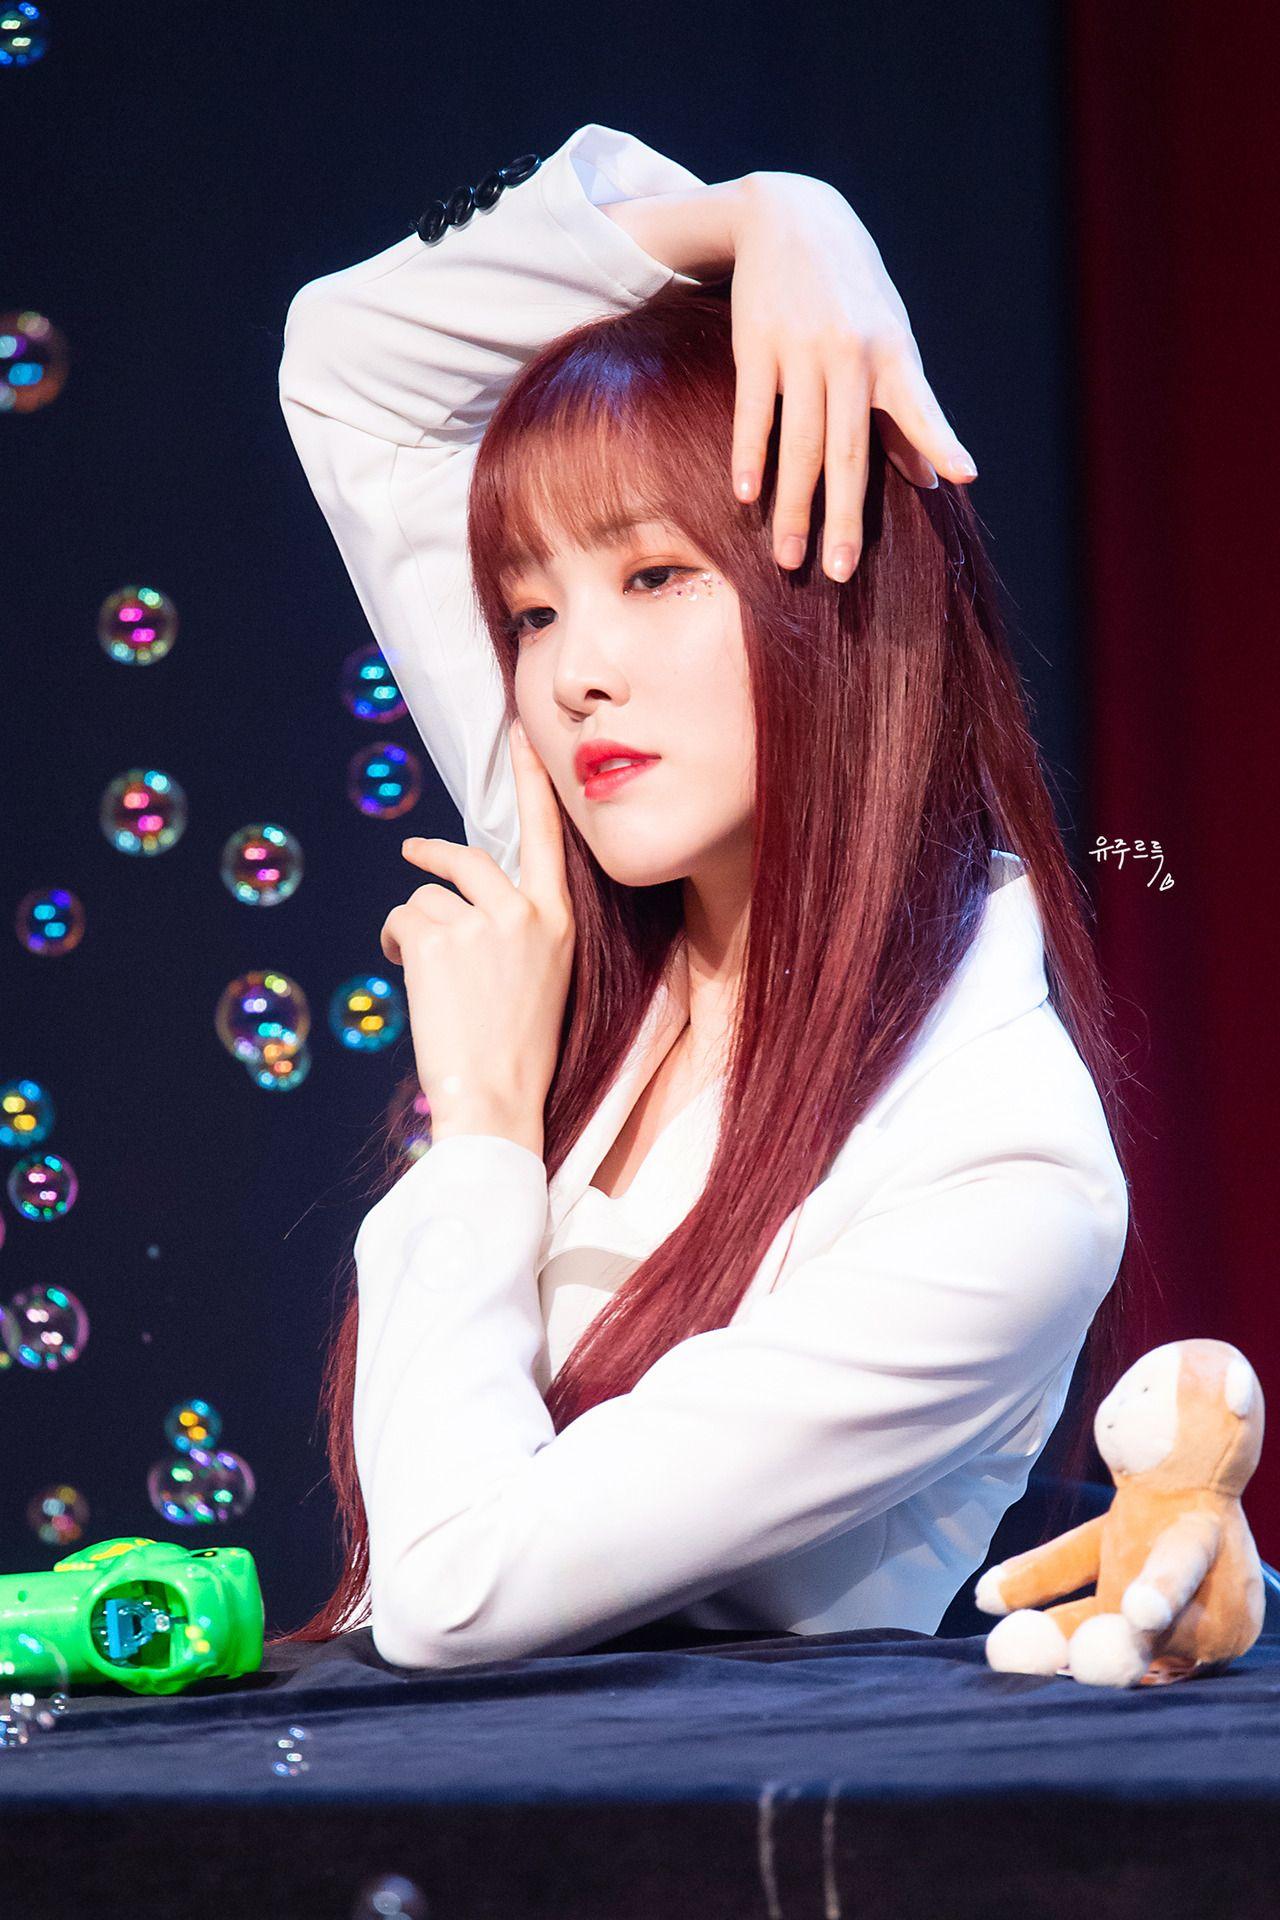 Gfriend United Kpop Idol Girl Online Cam Girls